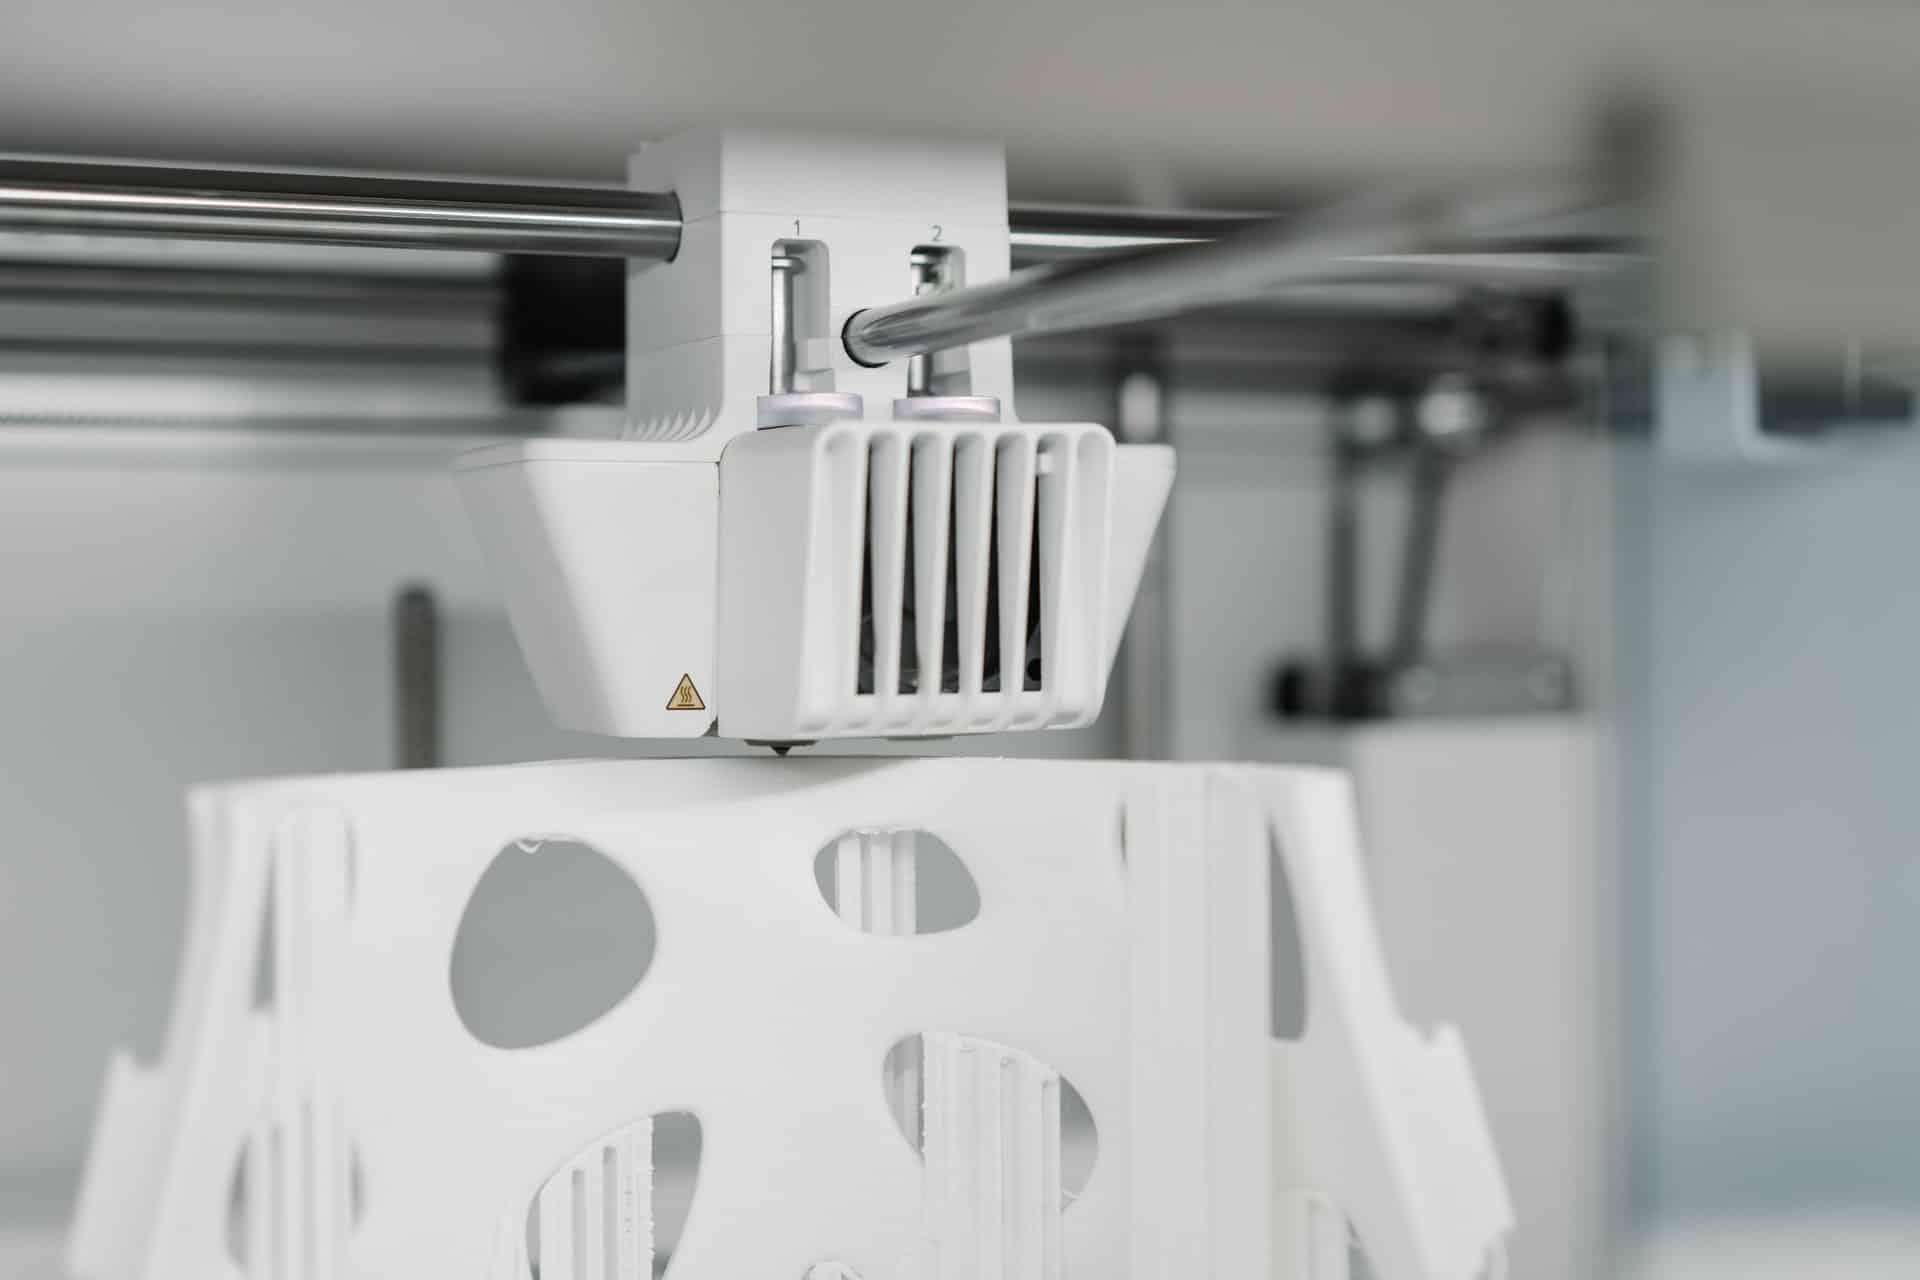 3D Printed Furniture Header Image